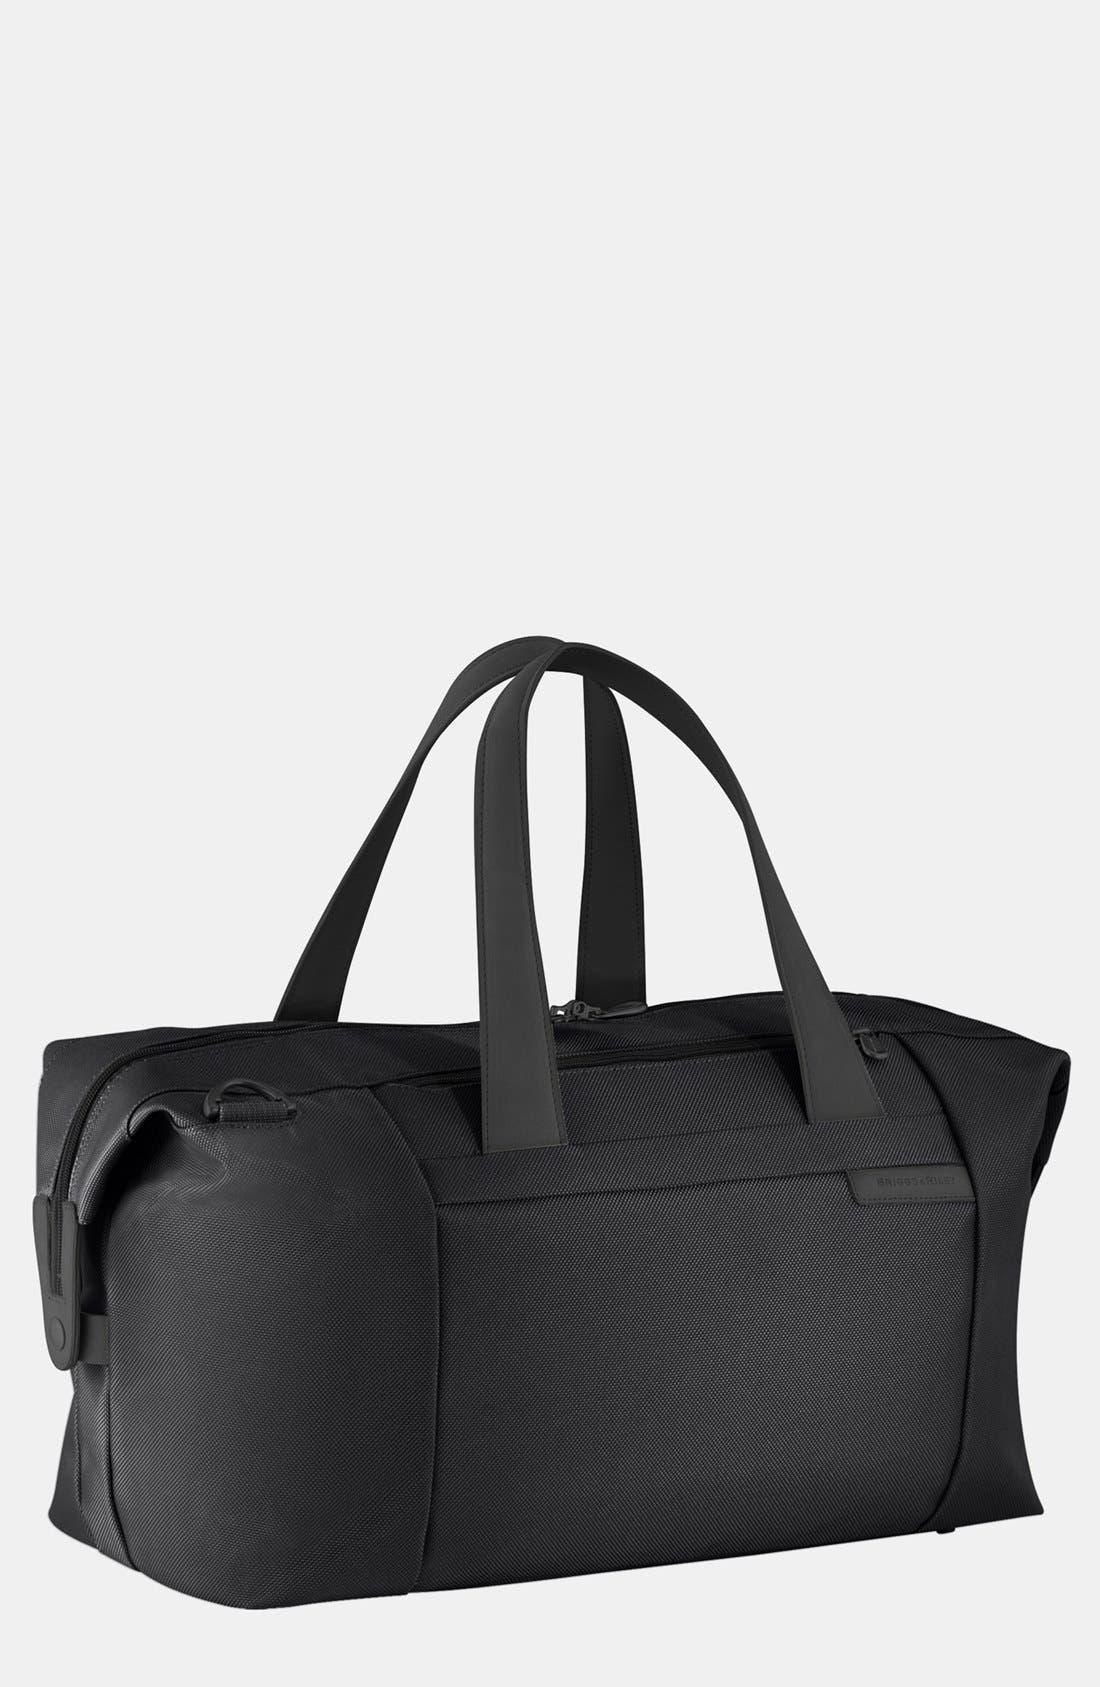 Alternate Image 1 Selected - Briggs & Riley 'Baseline' Duffel Bag (19 Inch)